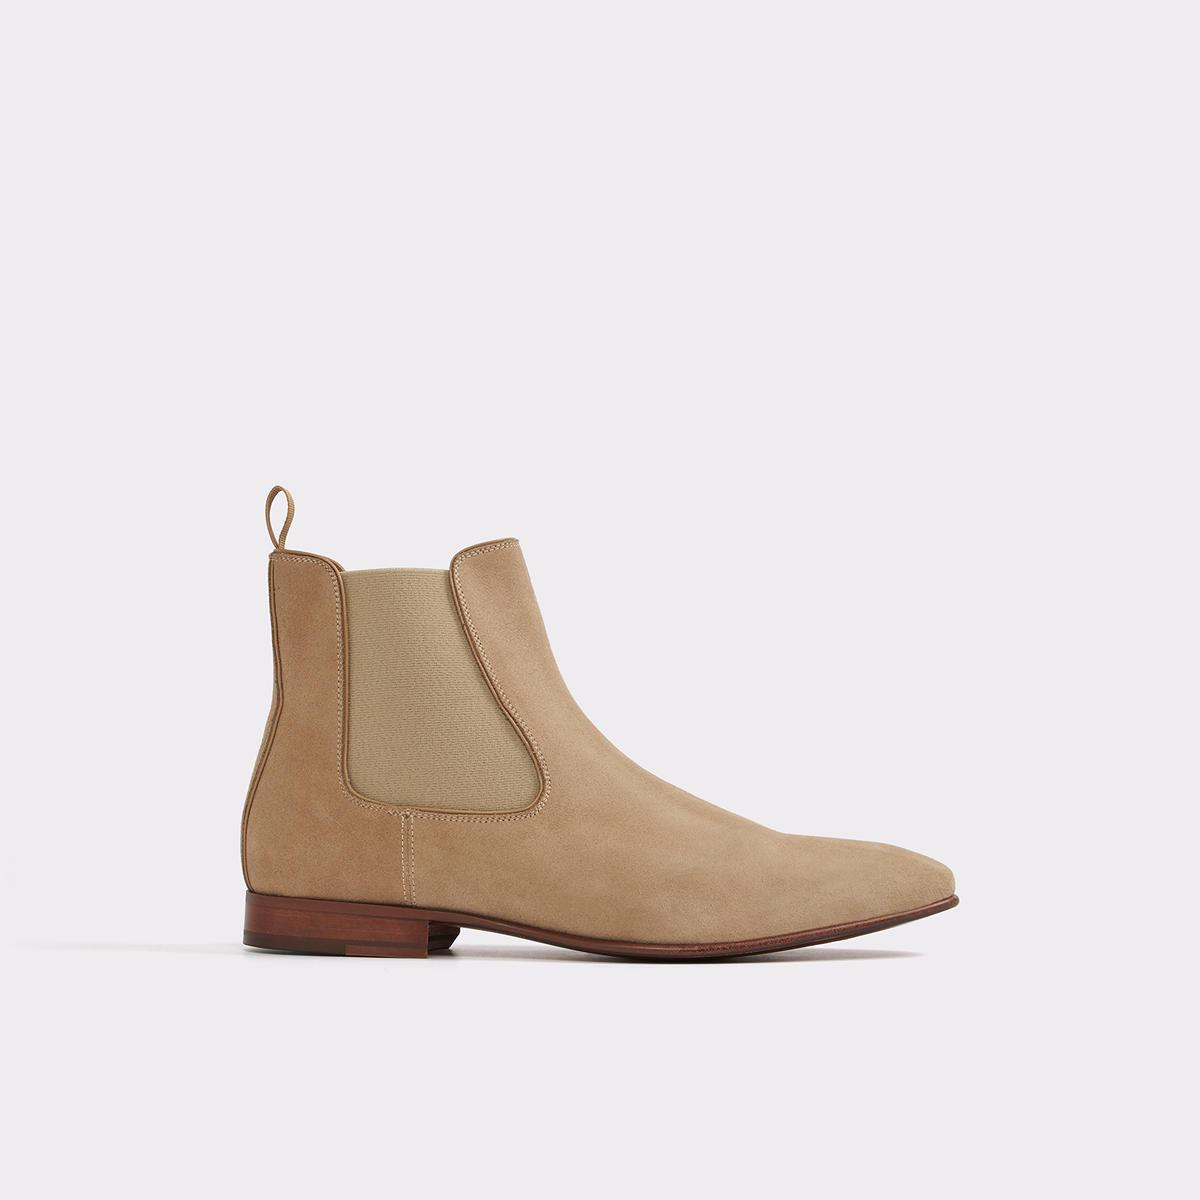 Biondi-R Beige Men's Dress boots | ALDO US at Aldo Shoes in Victor, NY | Tuggl